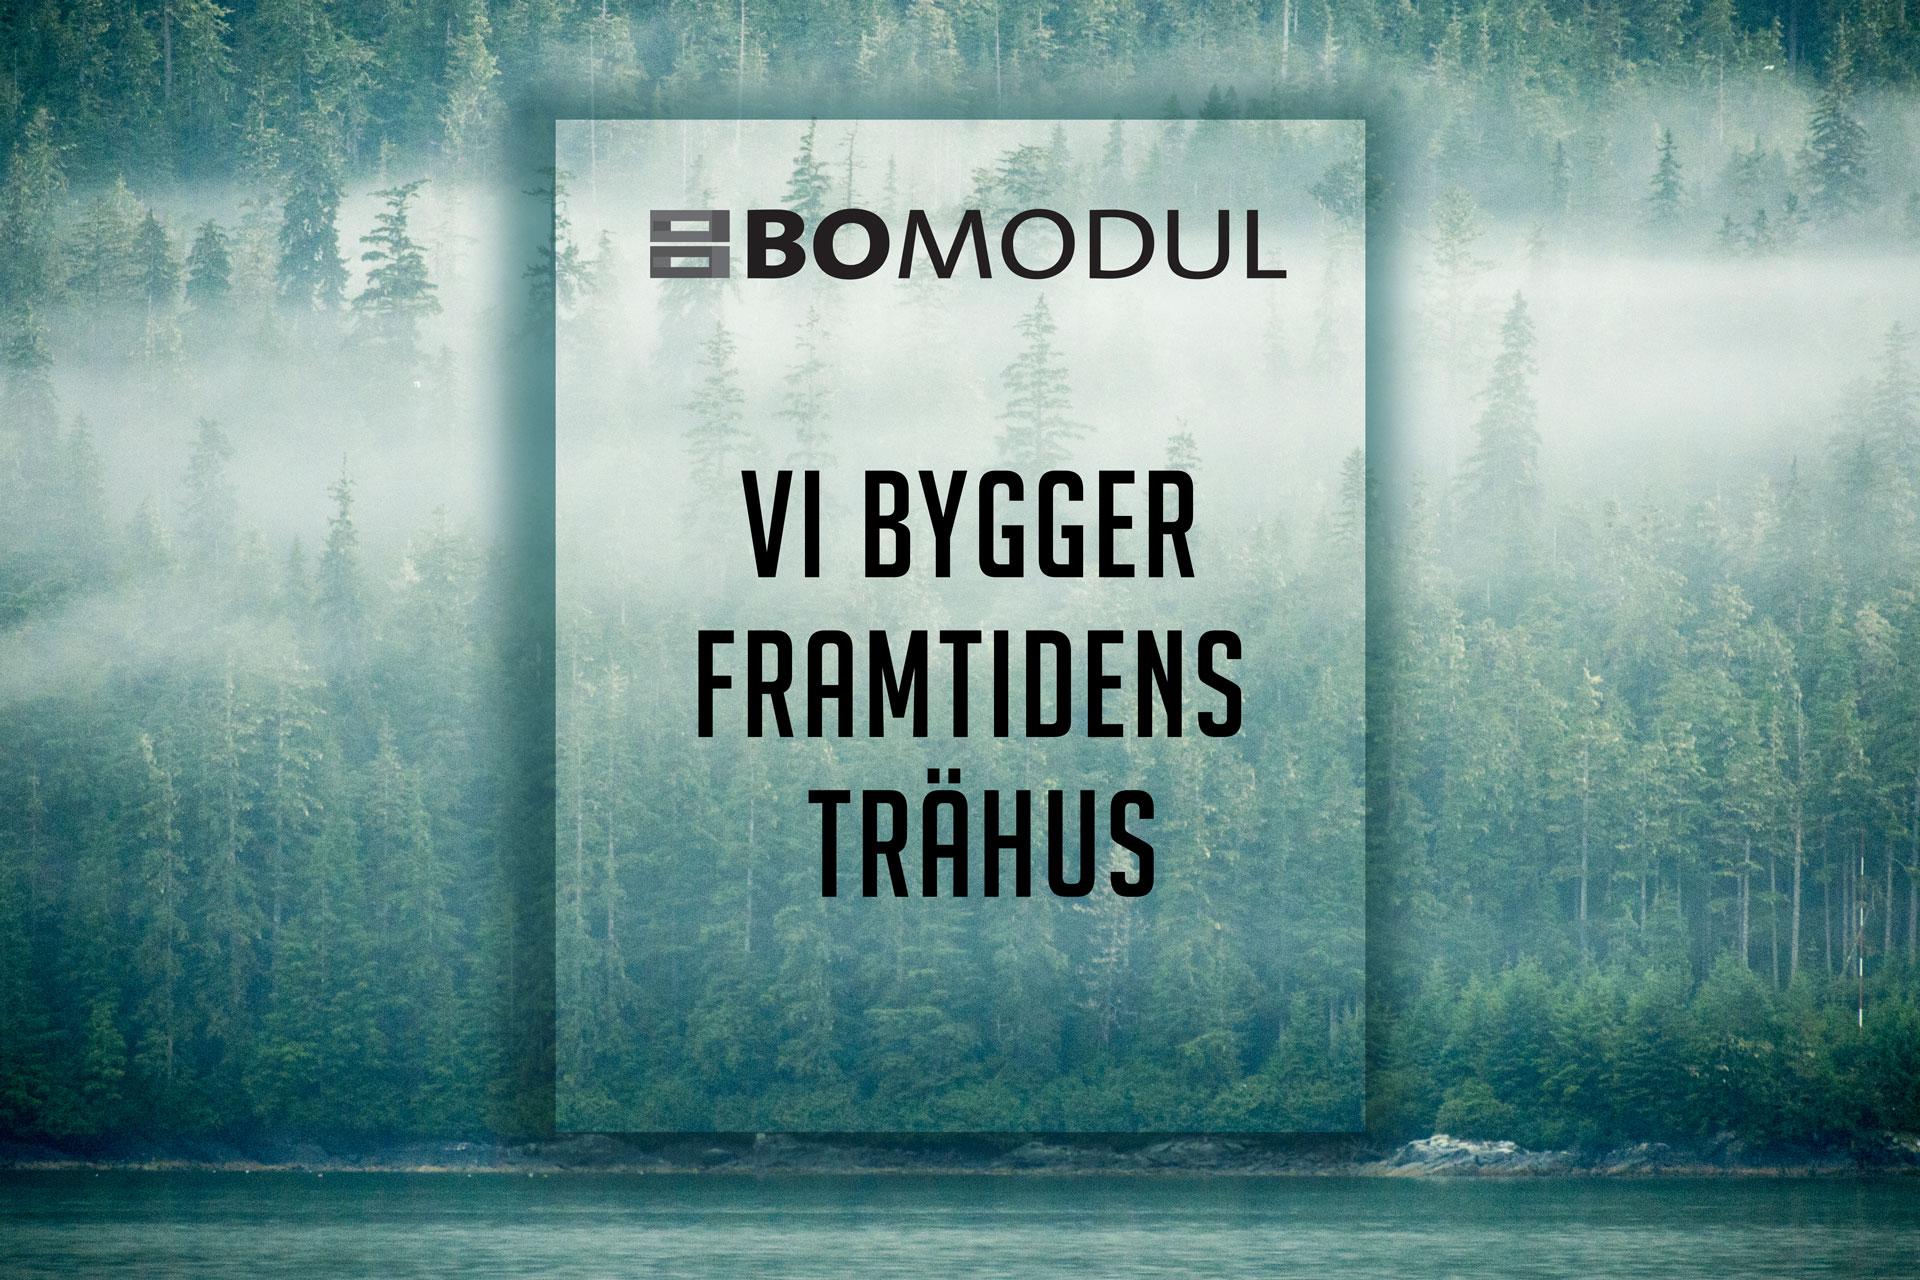 Jangenfalk & Lundevall, Bomodul